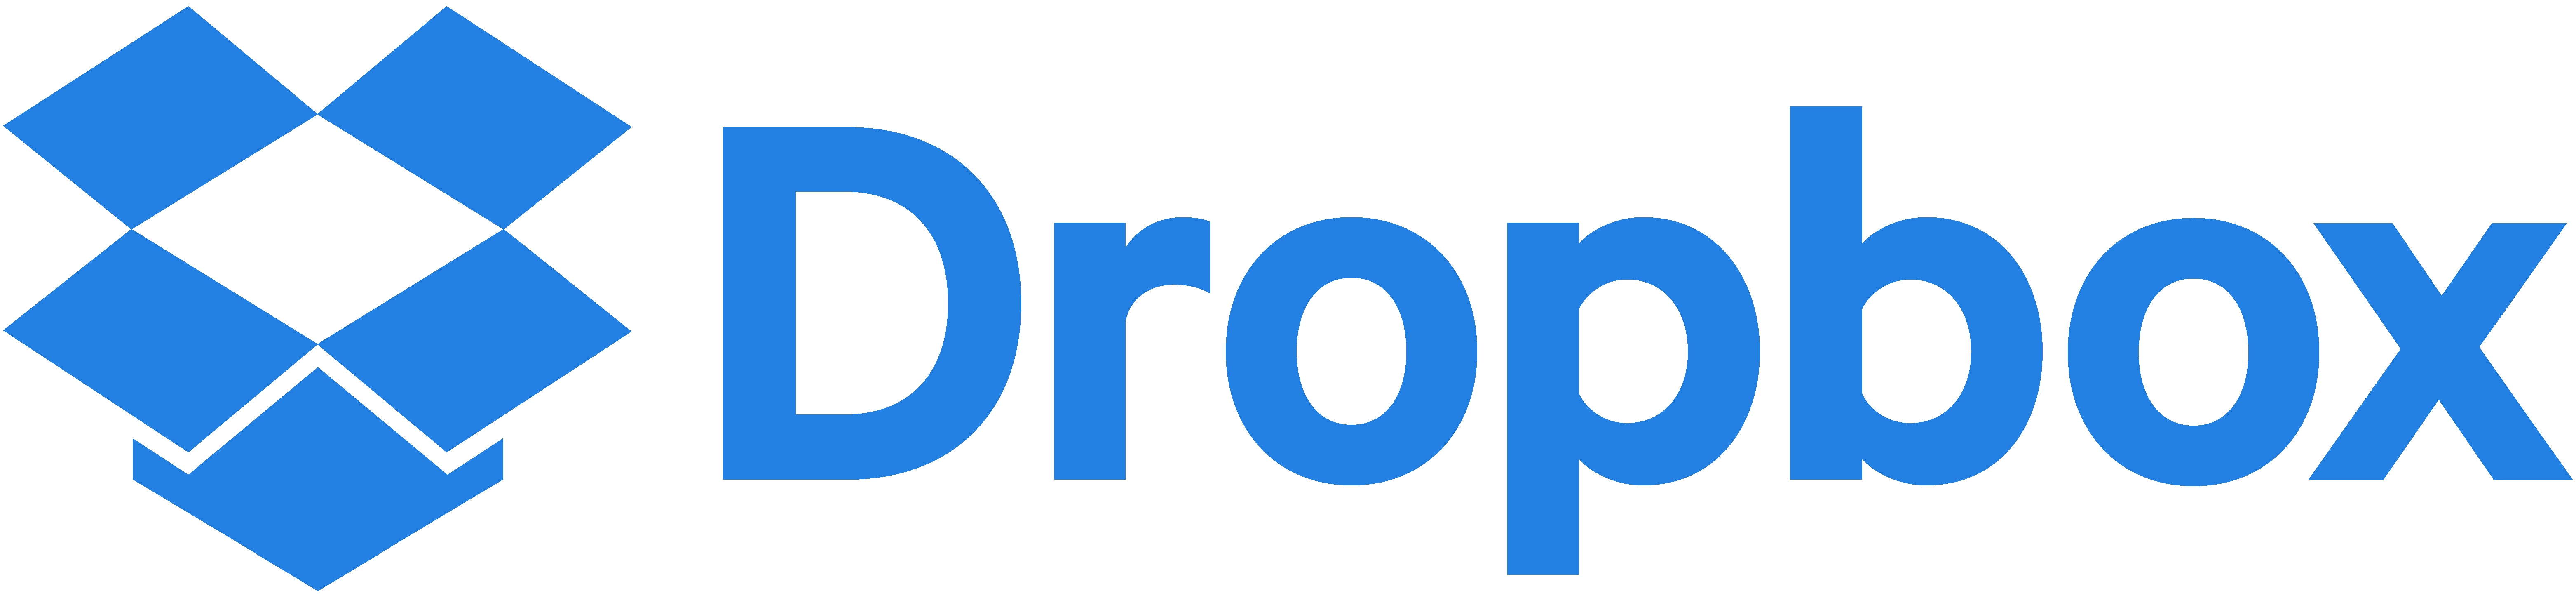 Dropbox Sidebar 1 Demo